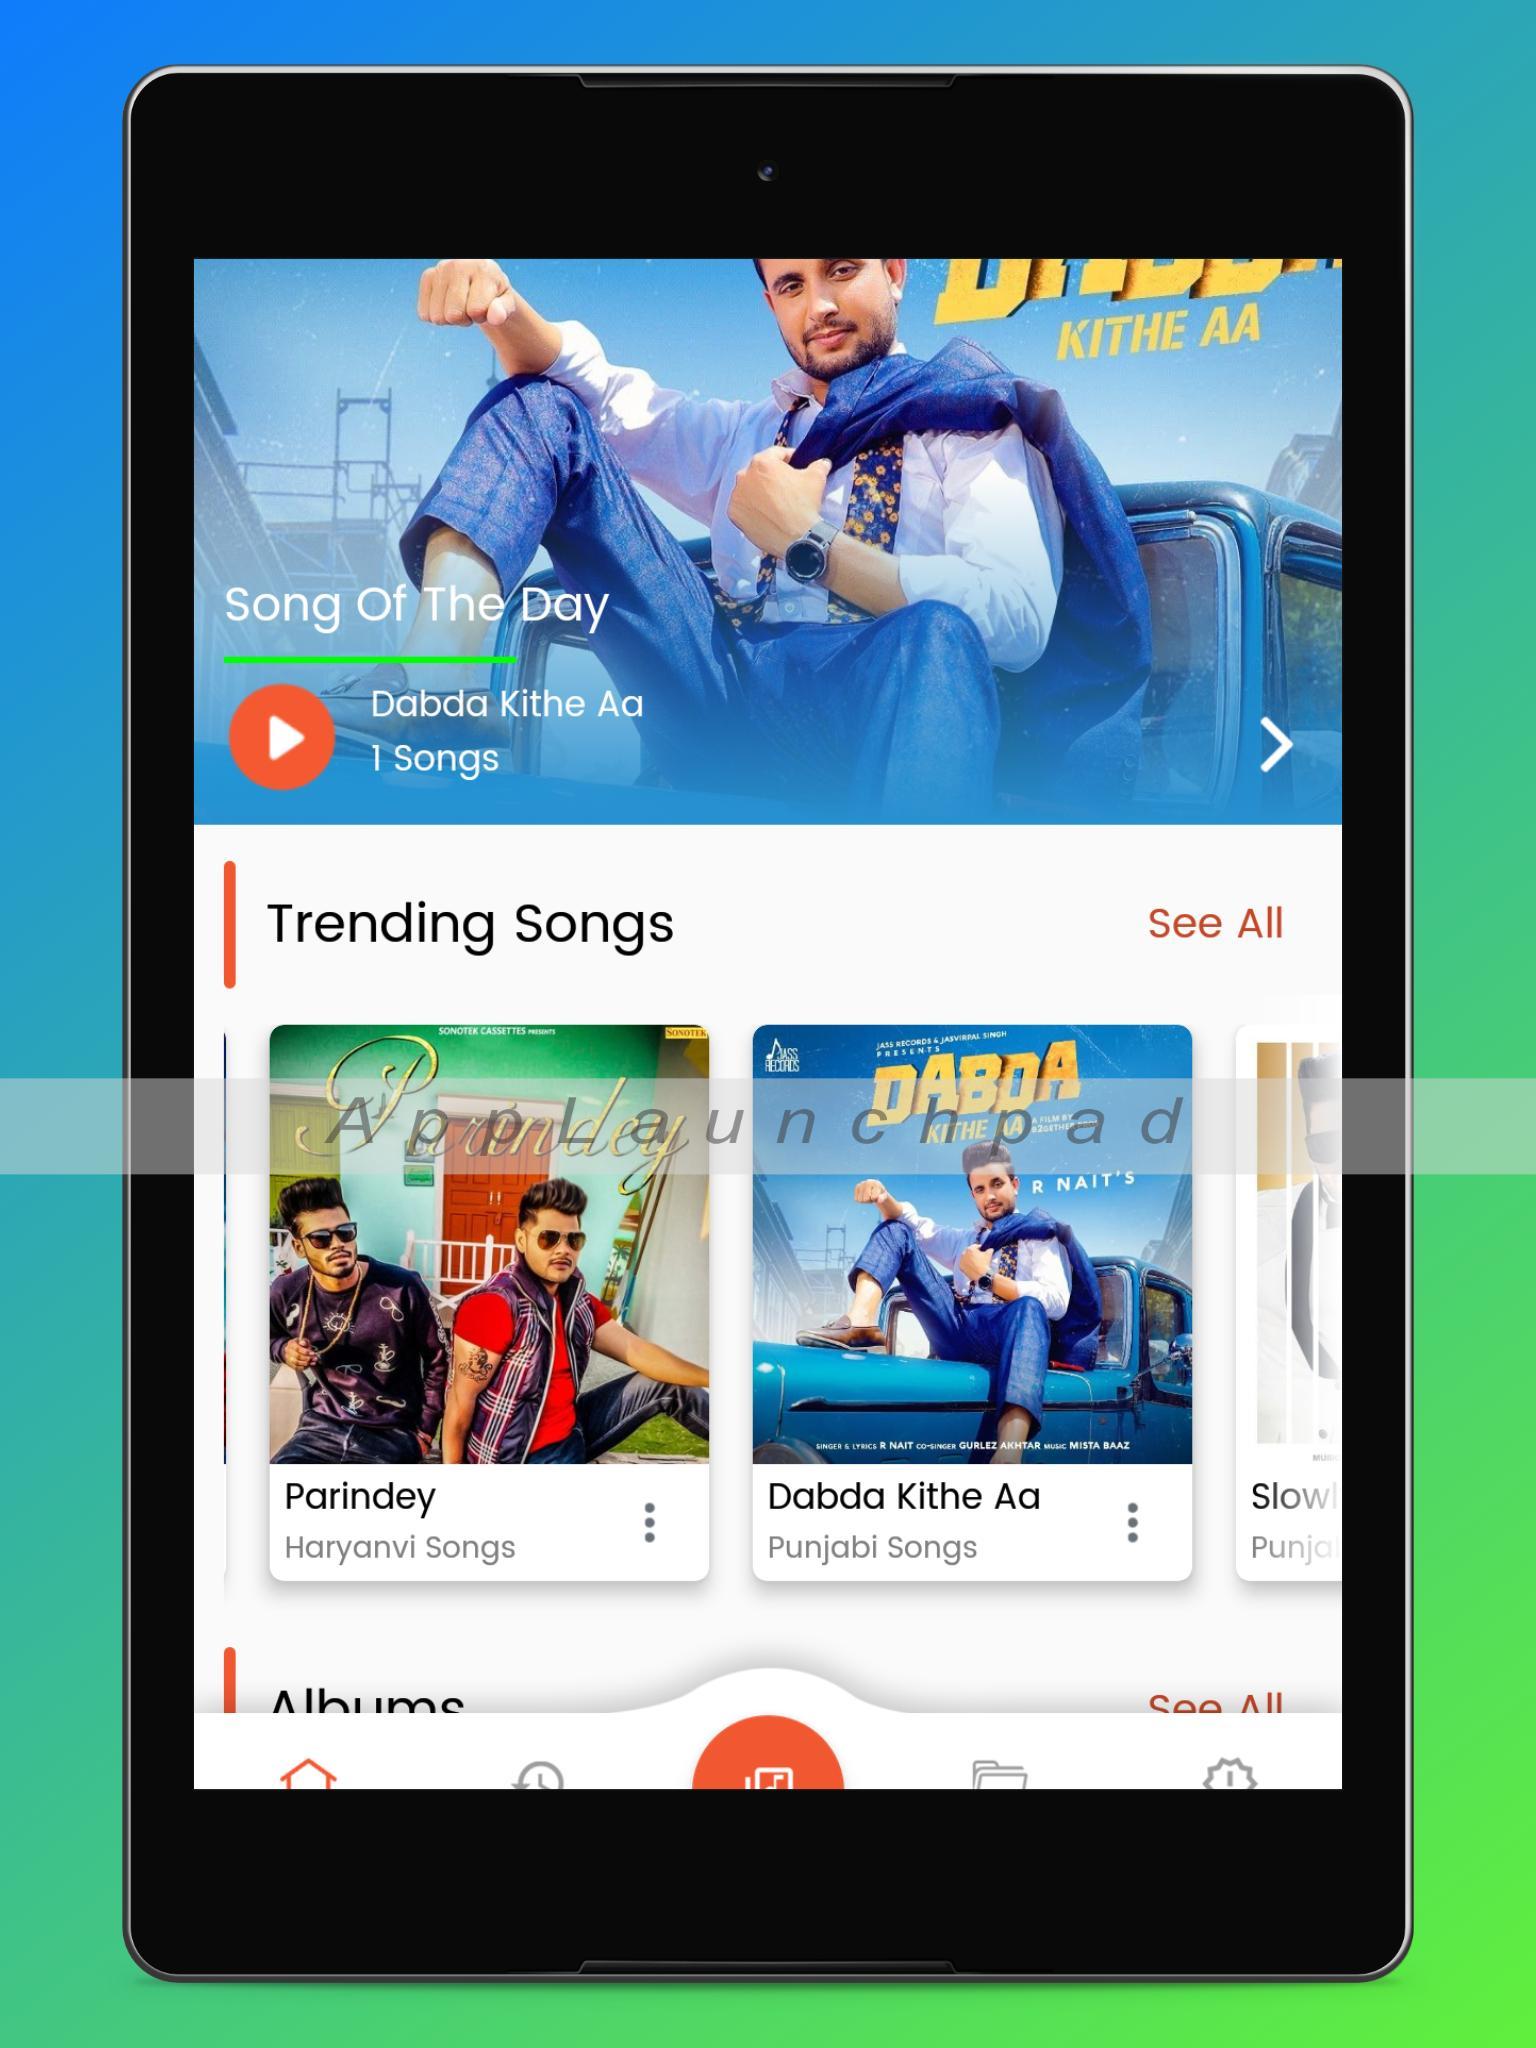 New Holi Mp3 Song Mp3 Download,Download Holi Dj songs Mp3 Dj Vikash Raja